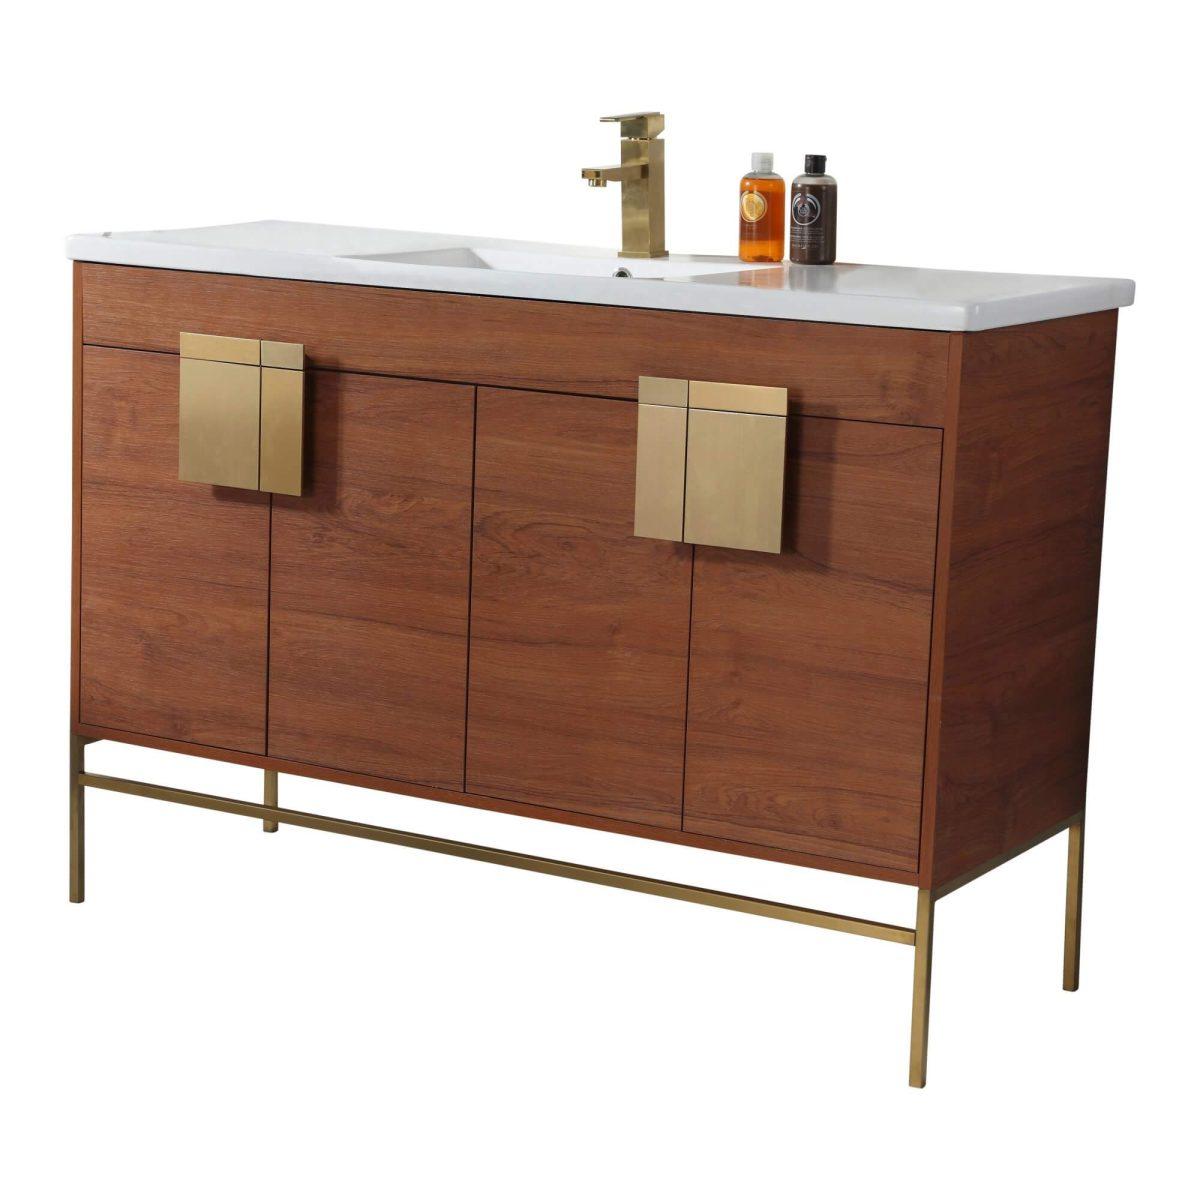 "Shawbridge 48"" Modern Single Bathroom Vanity  Spicy Walnut with Satin Brass Hardware"